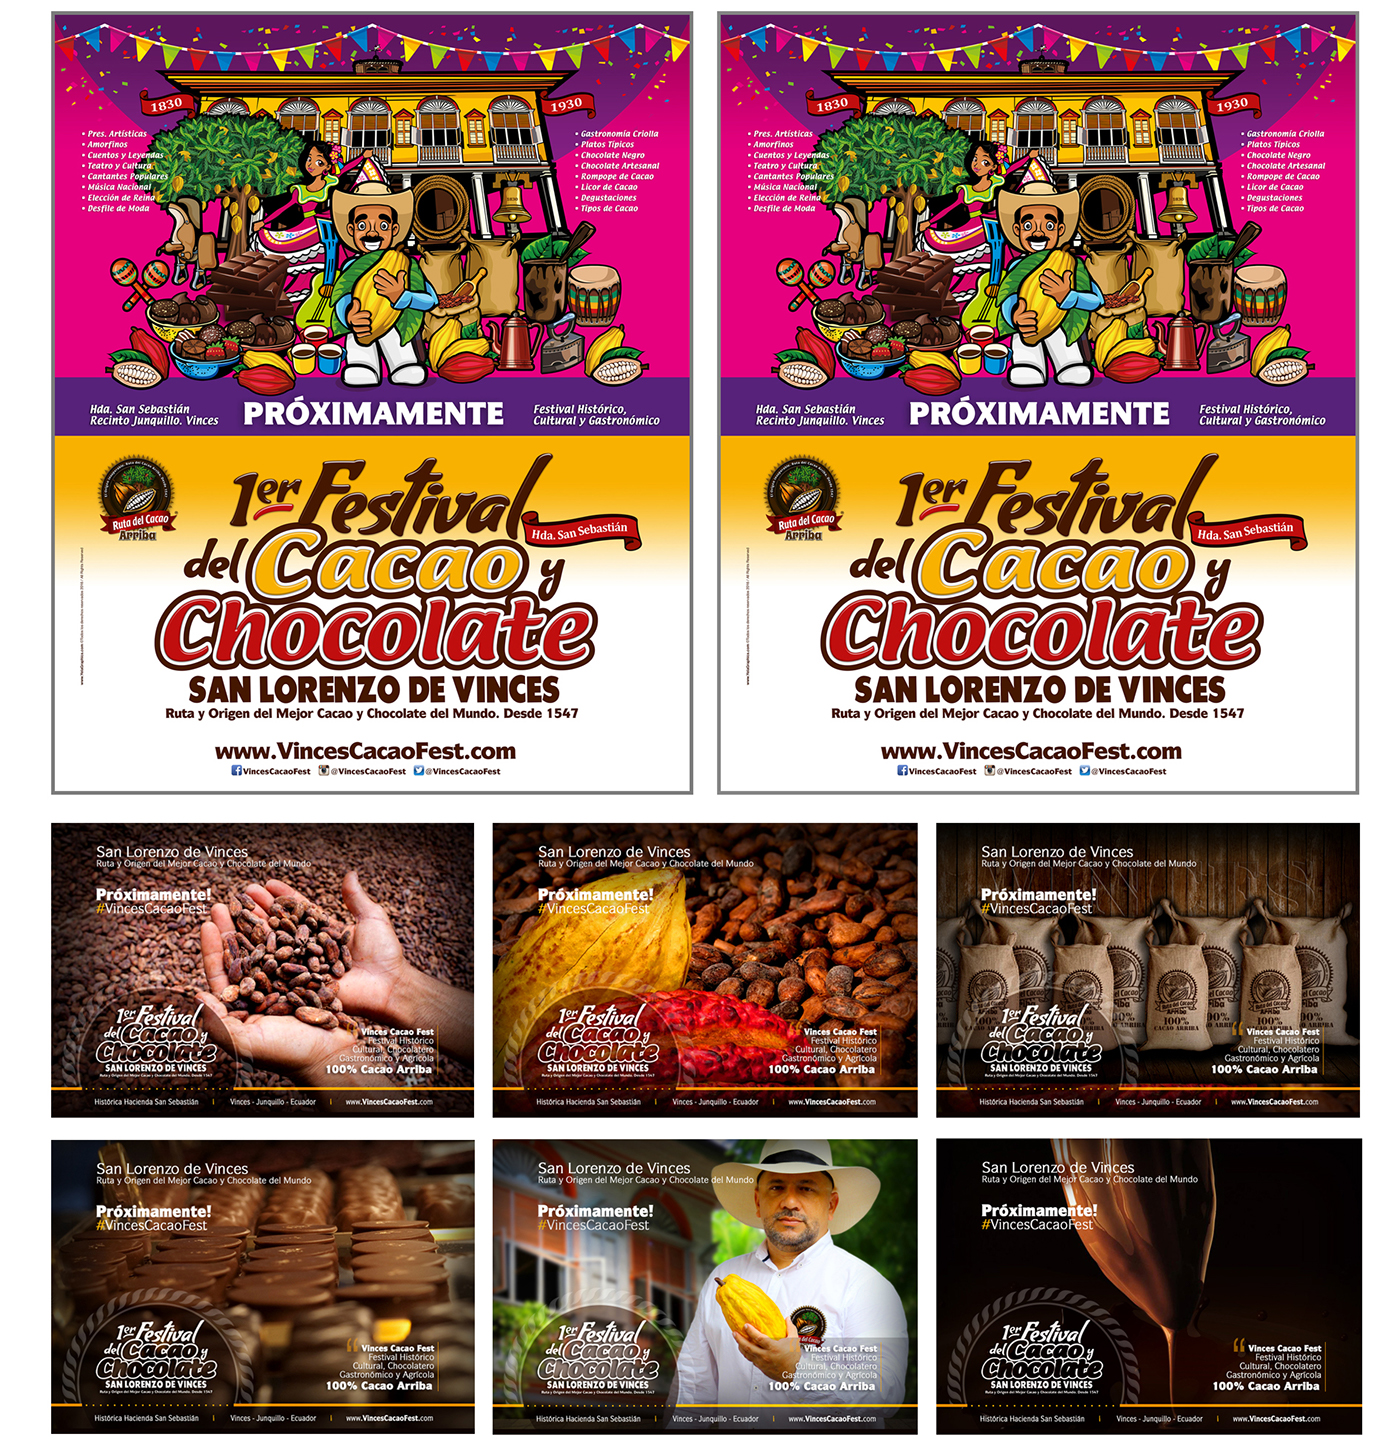 cacao Cocoa chocolate Vinces Ecuador guayaquil cacao fest festival Travel poster